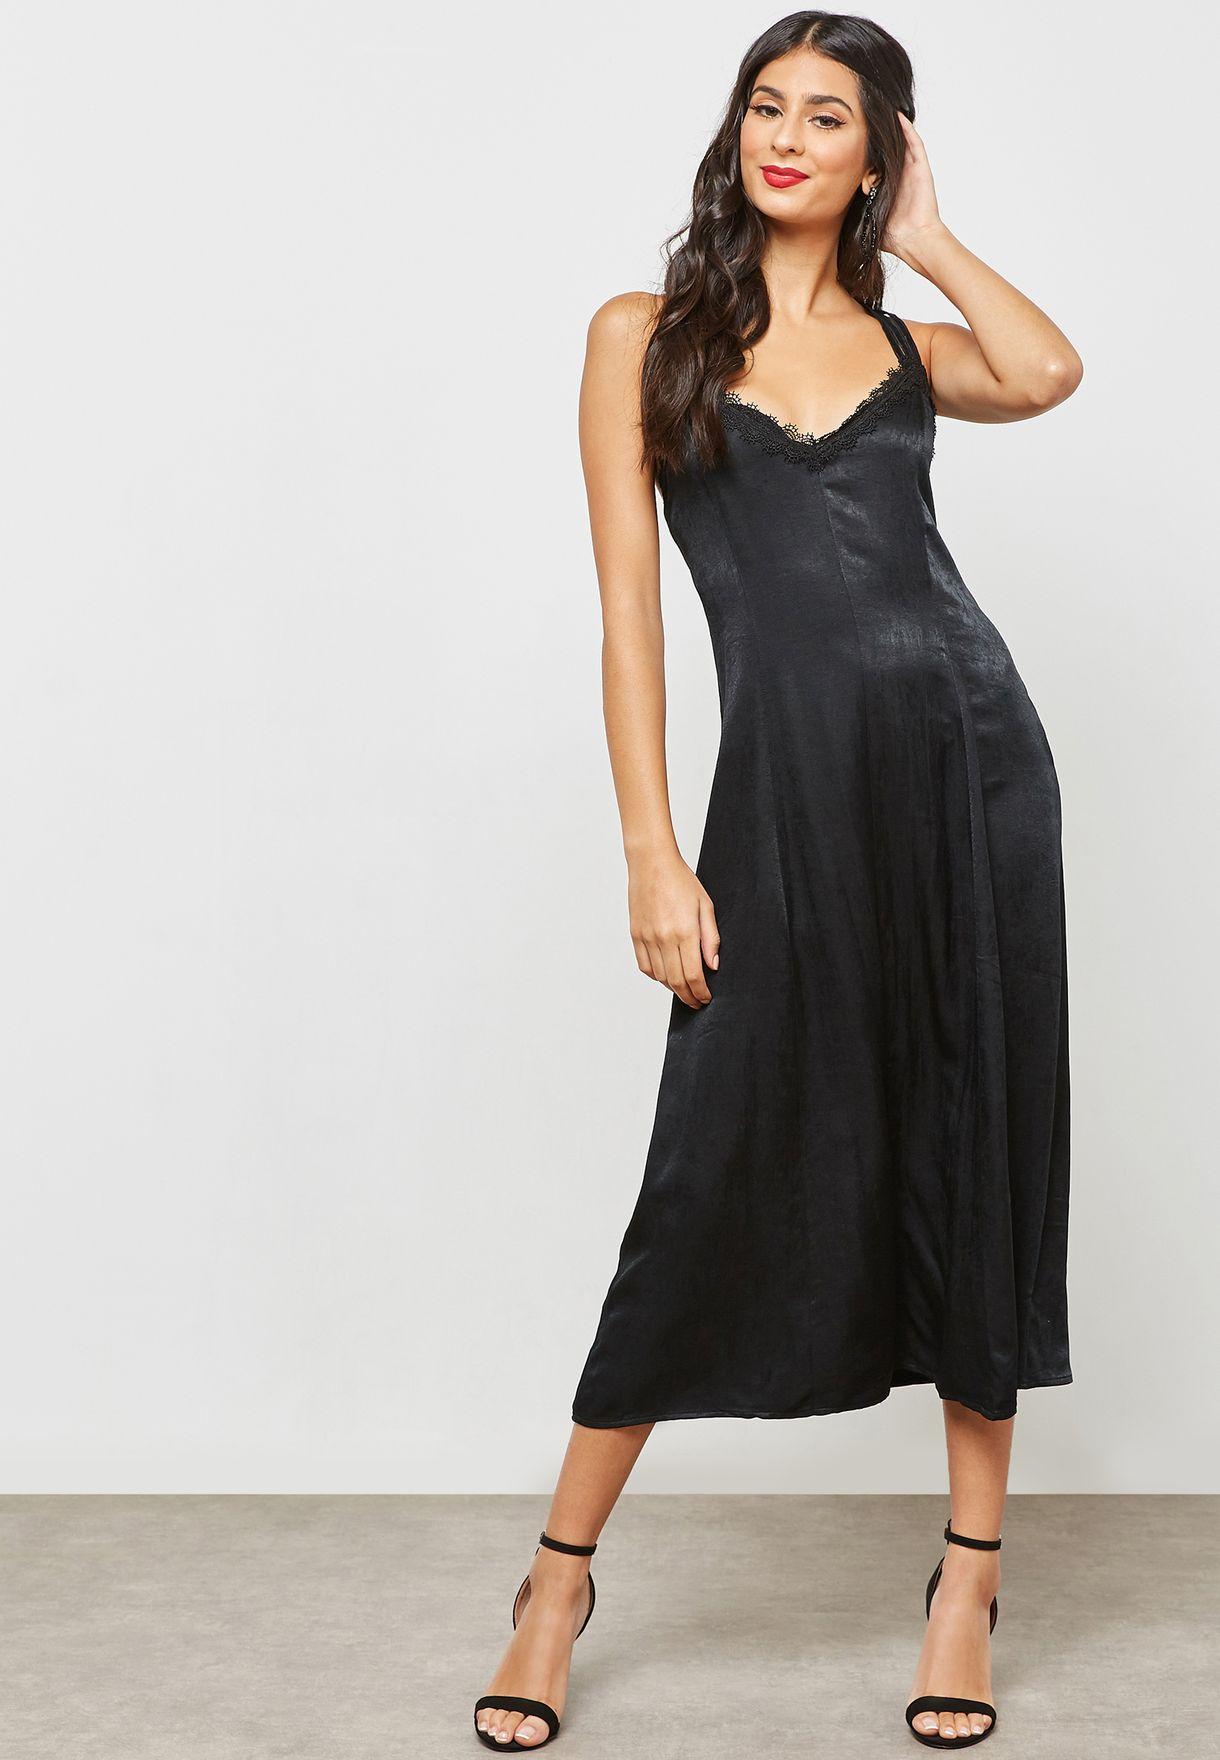 Strappy Crisscross Back Dress